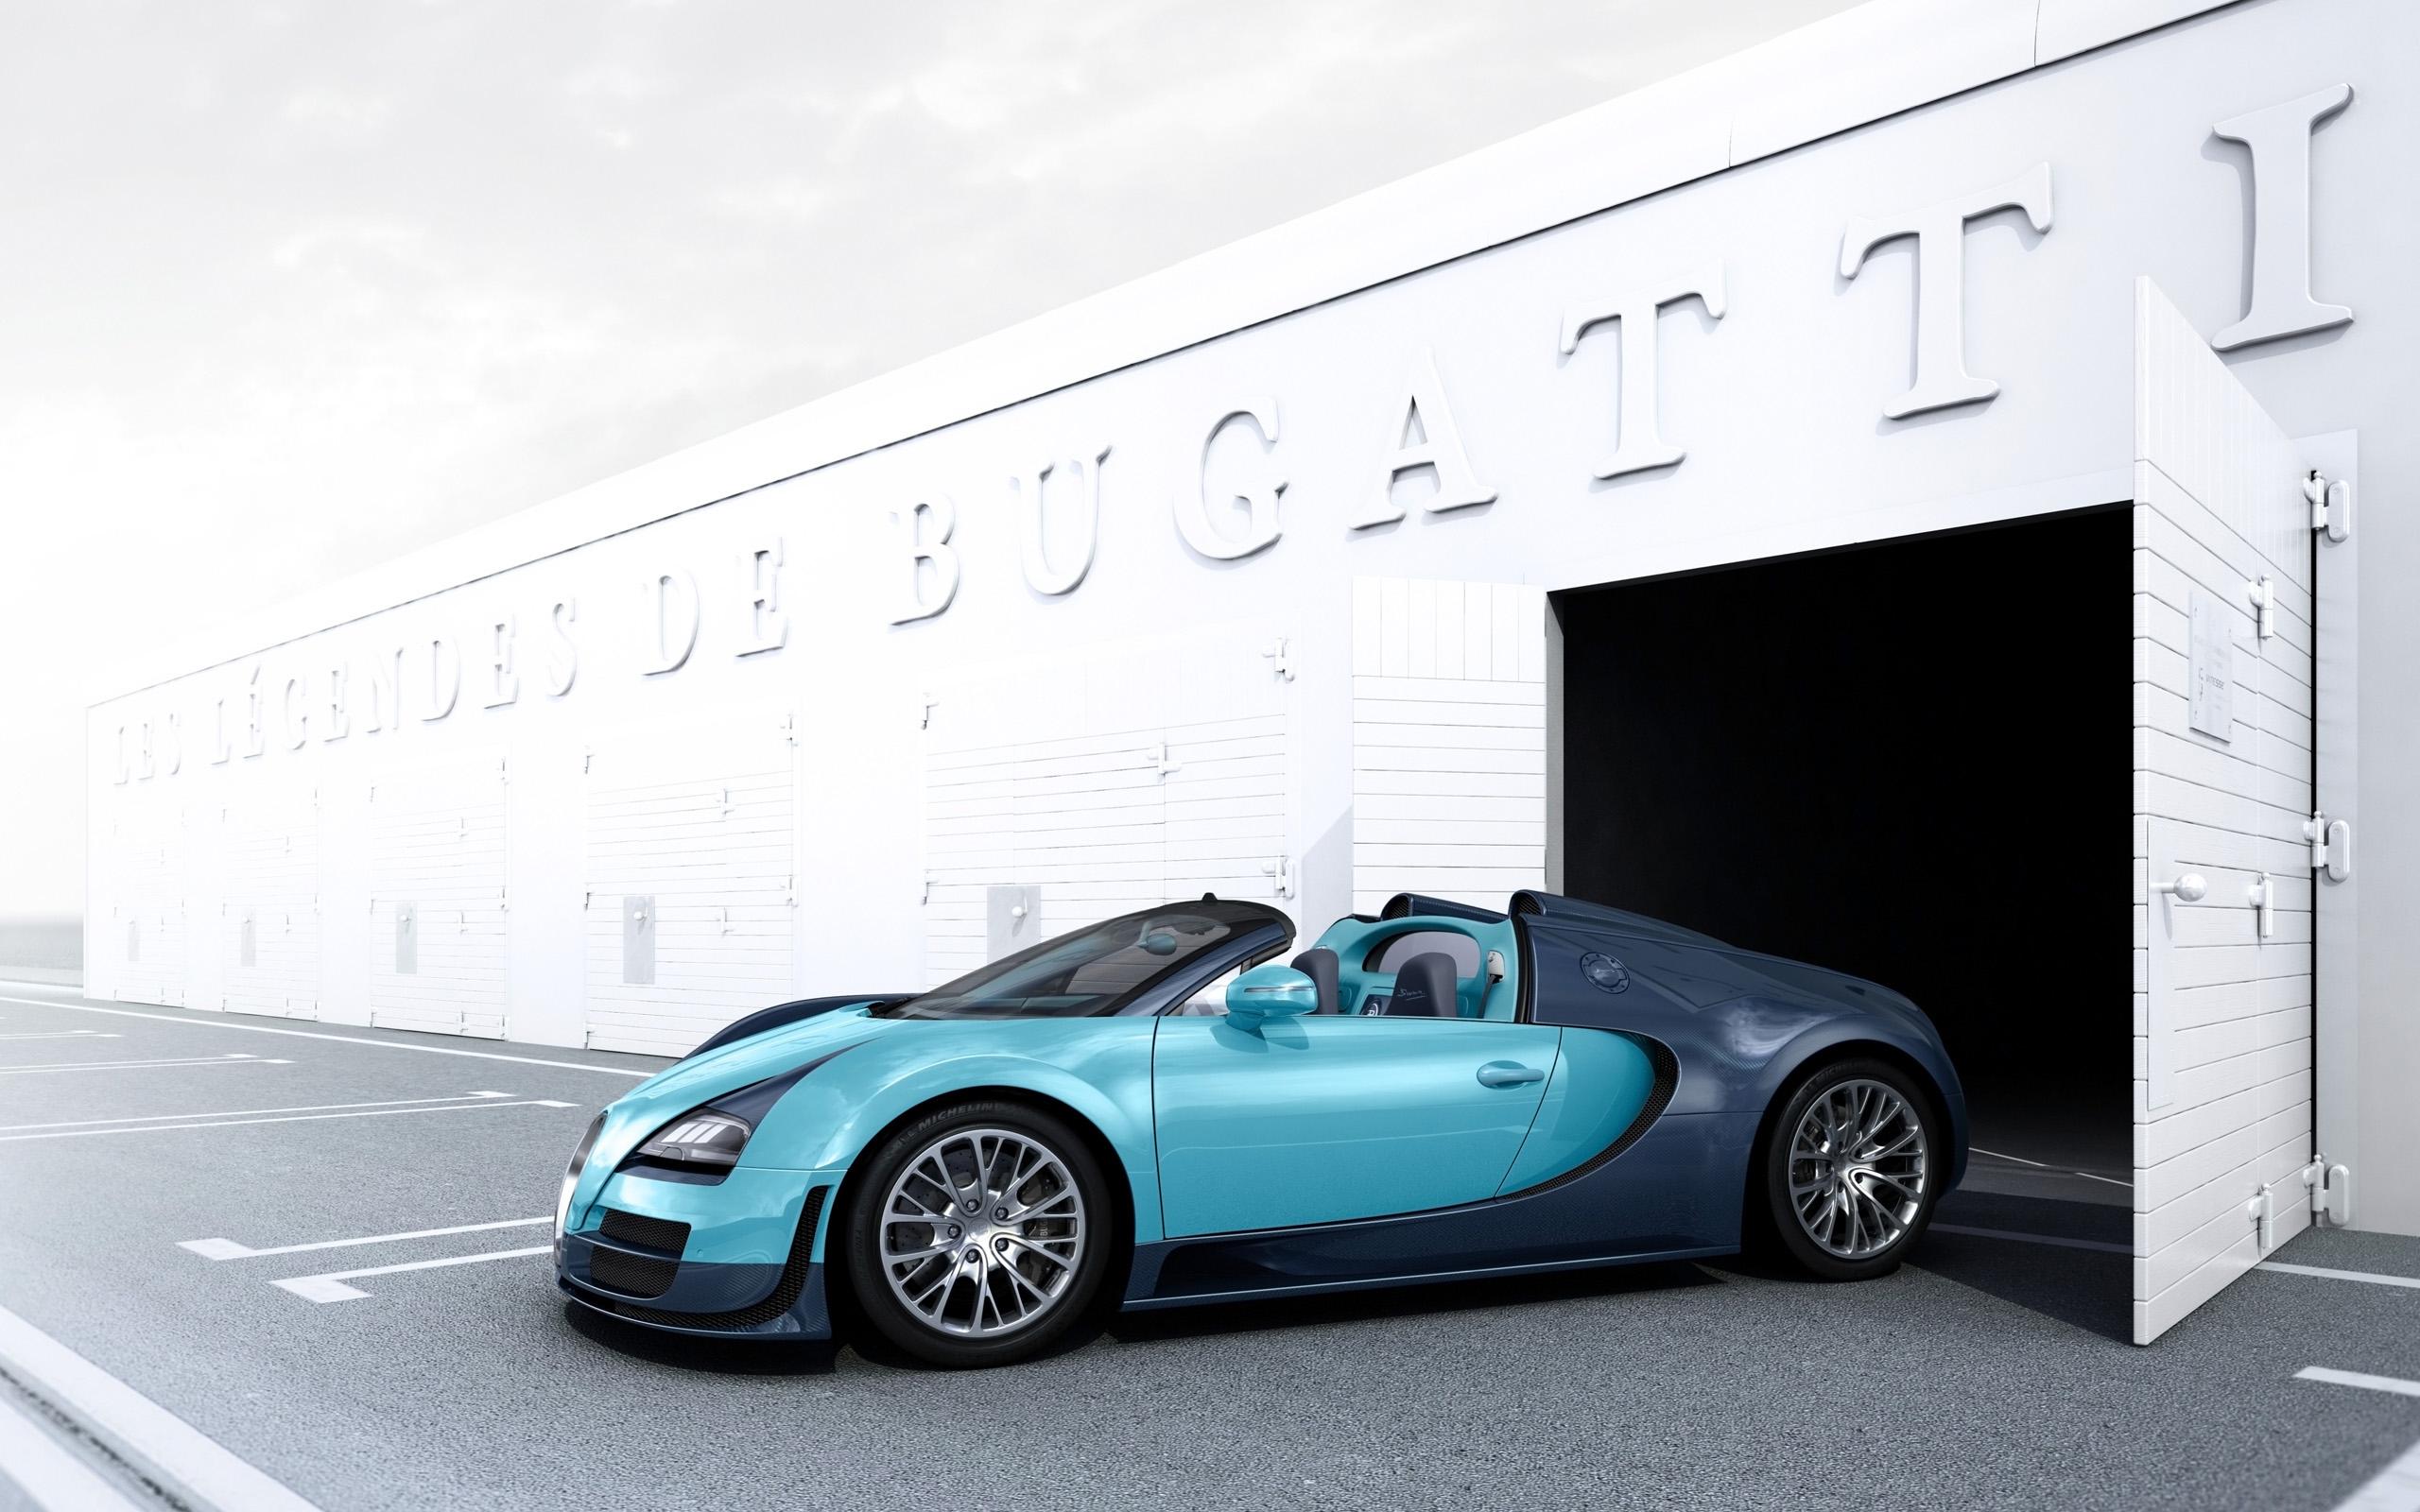 2013 bugatti veyron grand sport vitesse legend jean pierre wimille 3 wallpaper hd car wallpapers. Black Bedroom Furniture Sets. Home Design Ideas